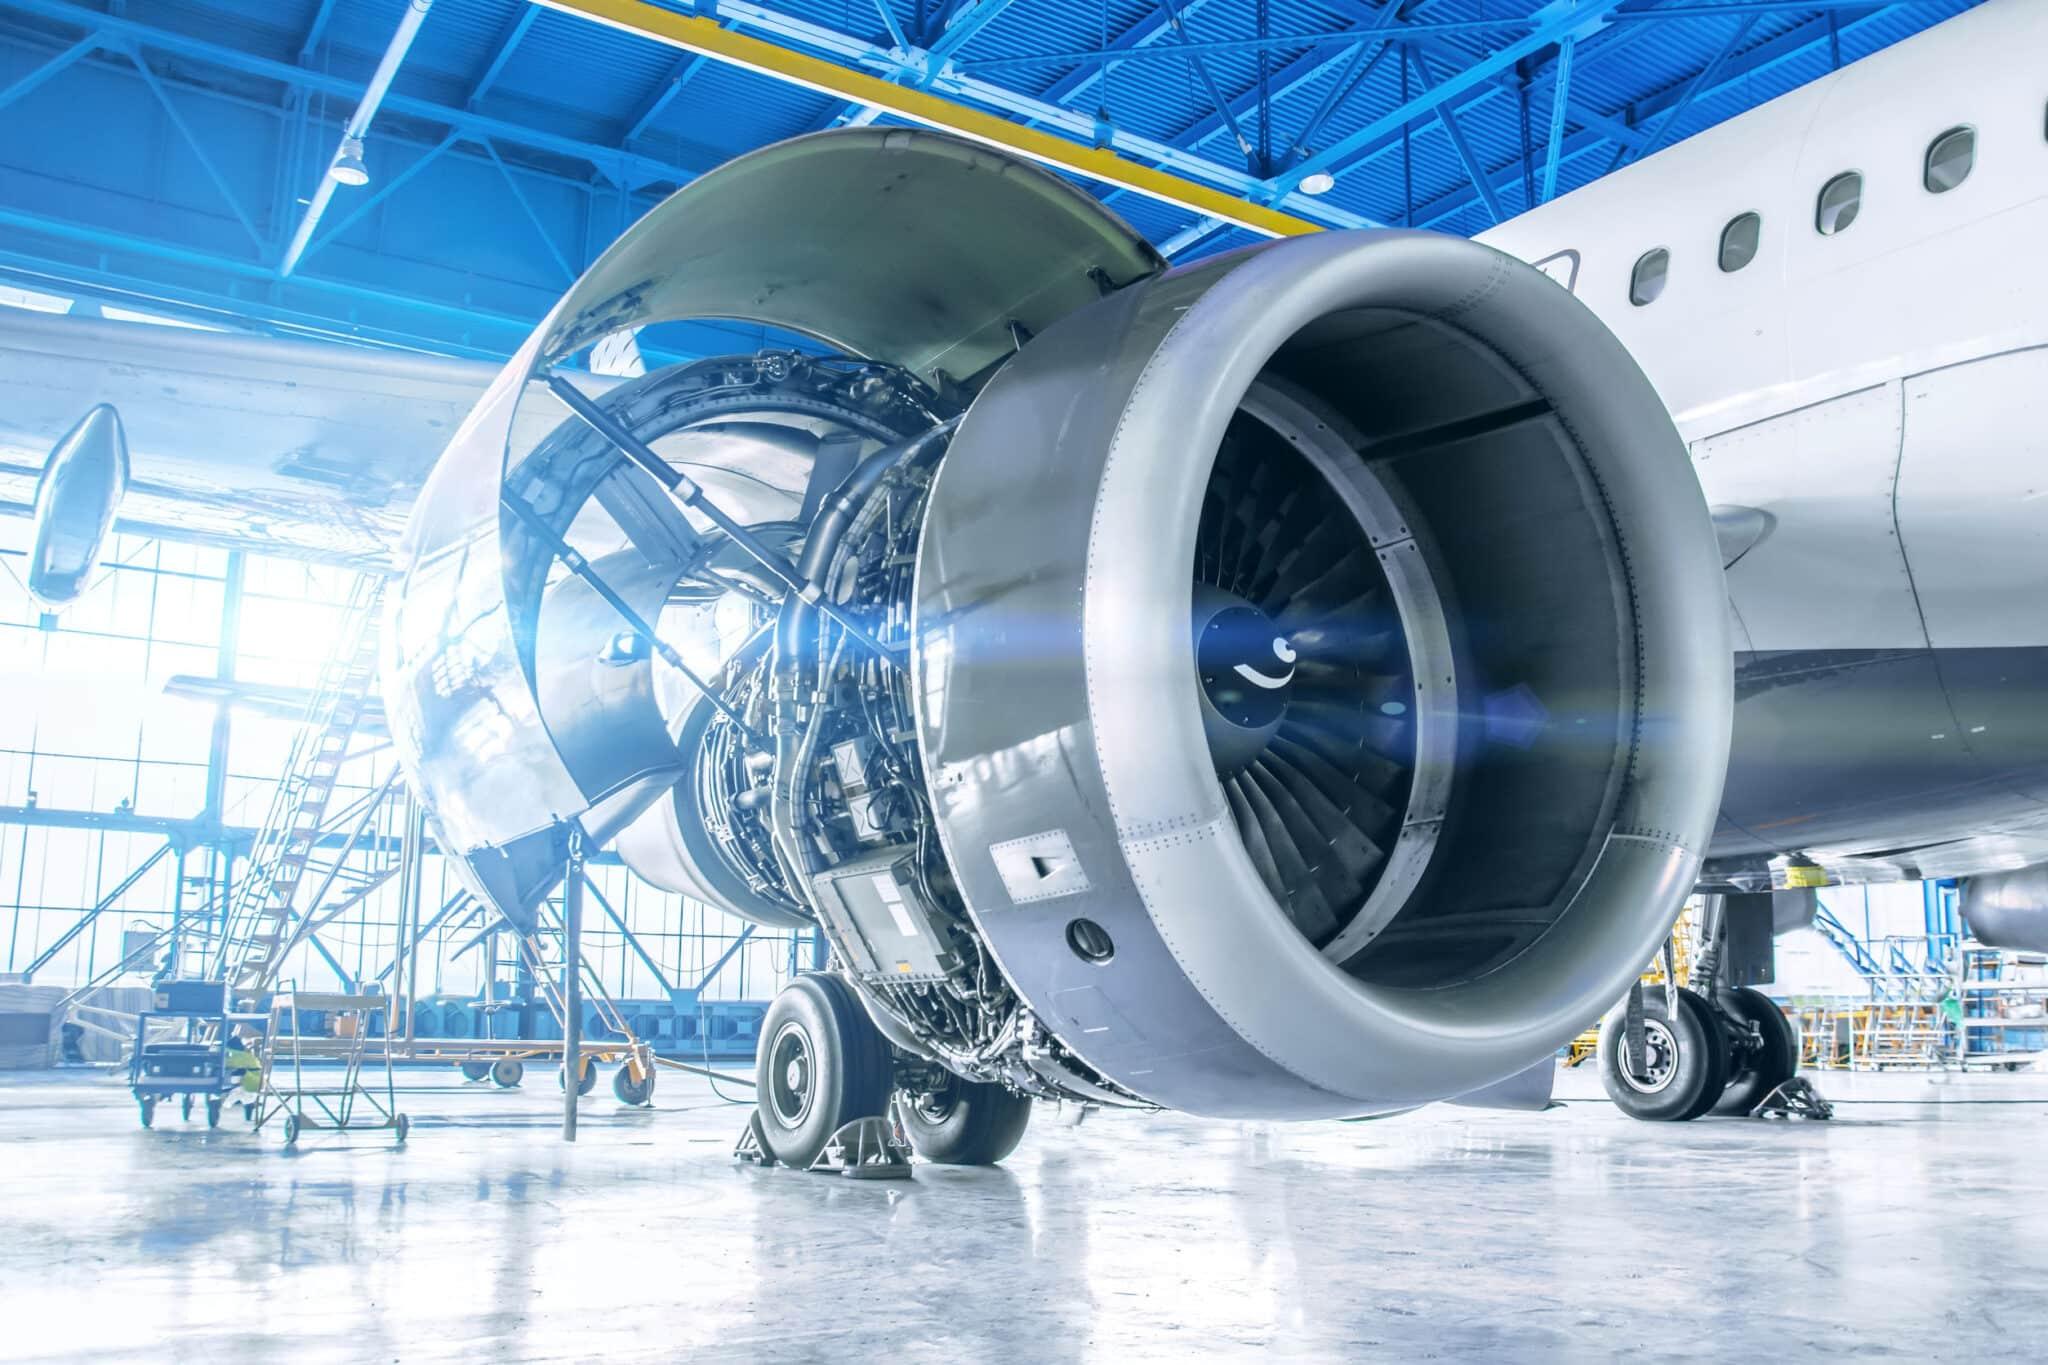 R&D Tax Credits Aerospace Industry